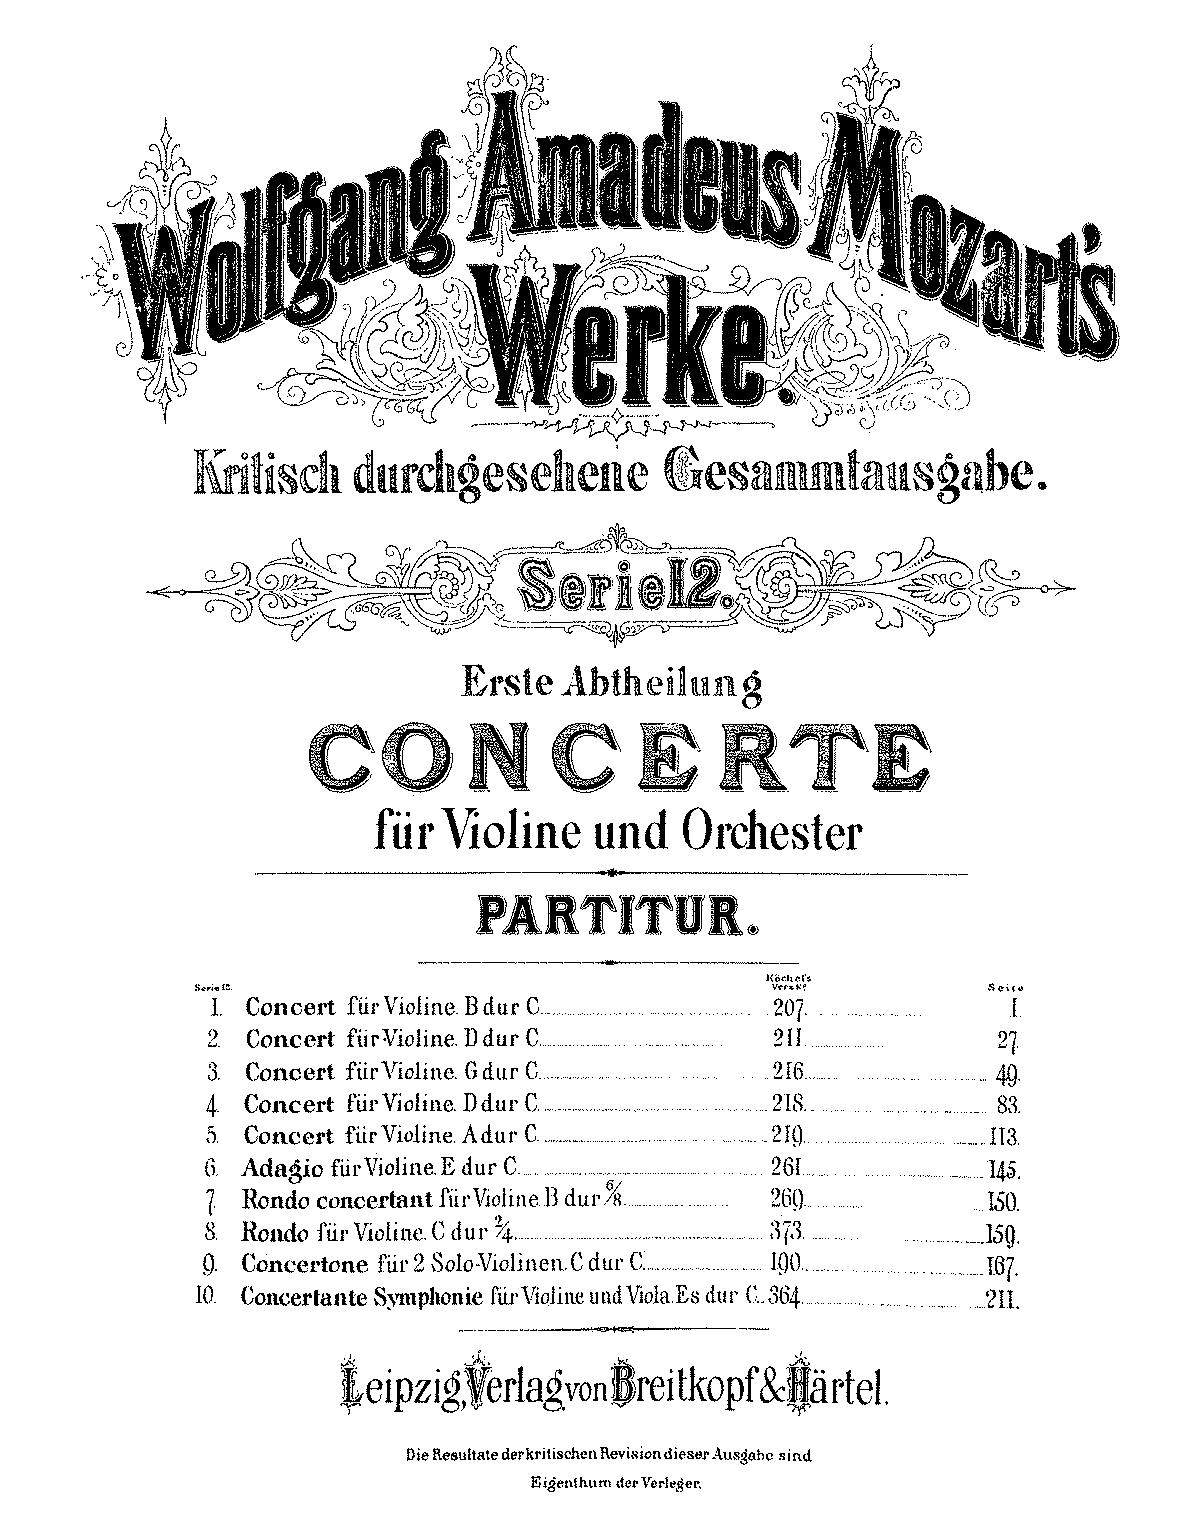 Adagio in E major, K.261 (Mozart, Wolfgang Amadeus